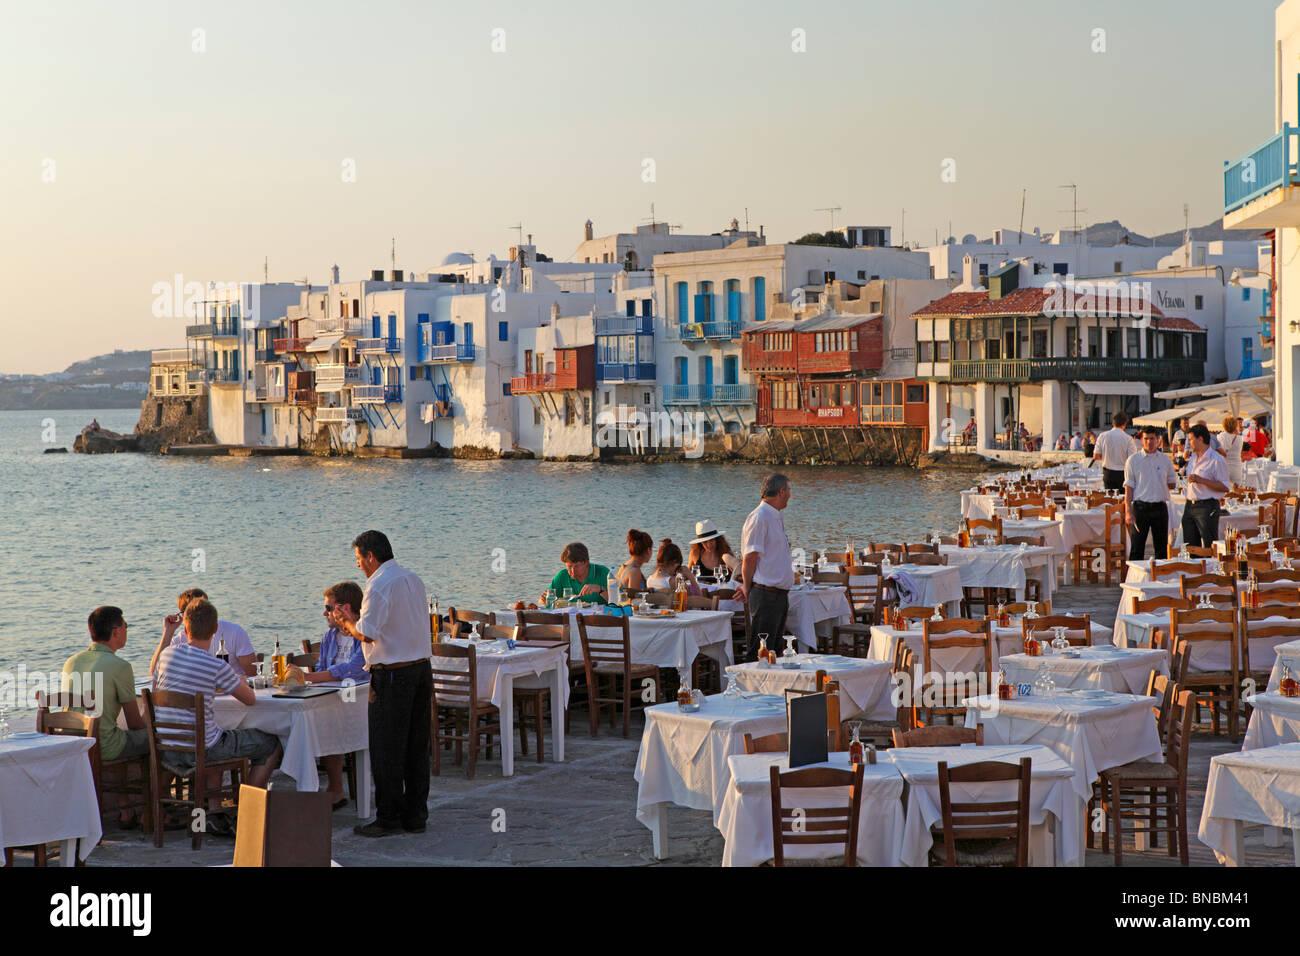 Venice Island Restaurants